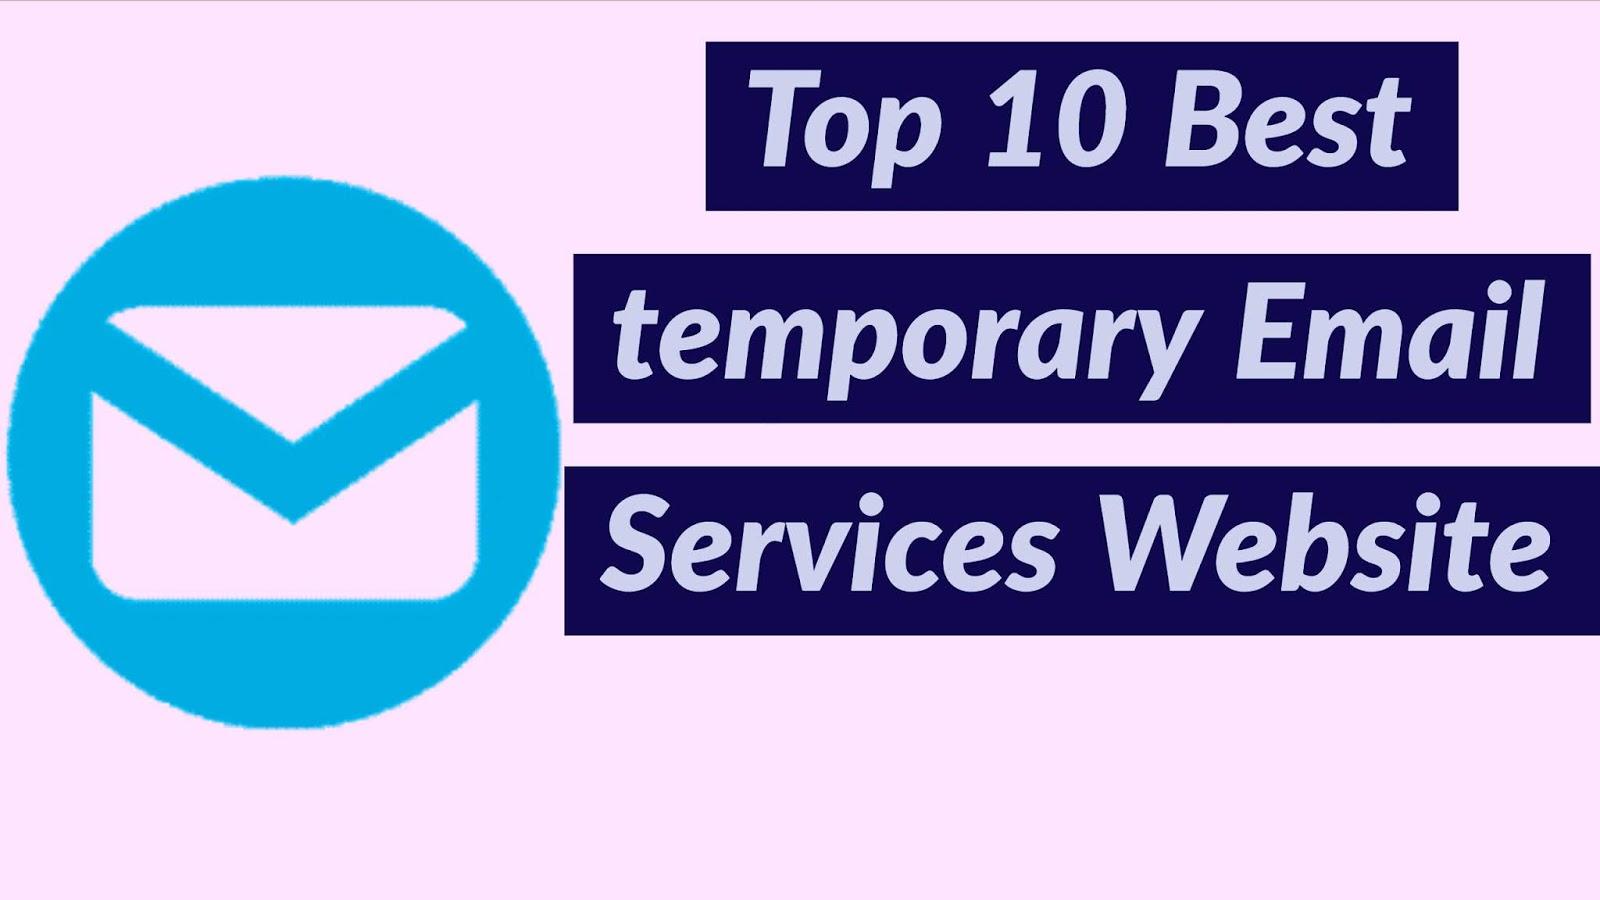 टॉप 10 बेस्ट 10 Minute Mail Alternatives Best